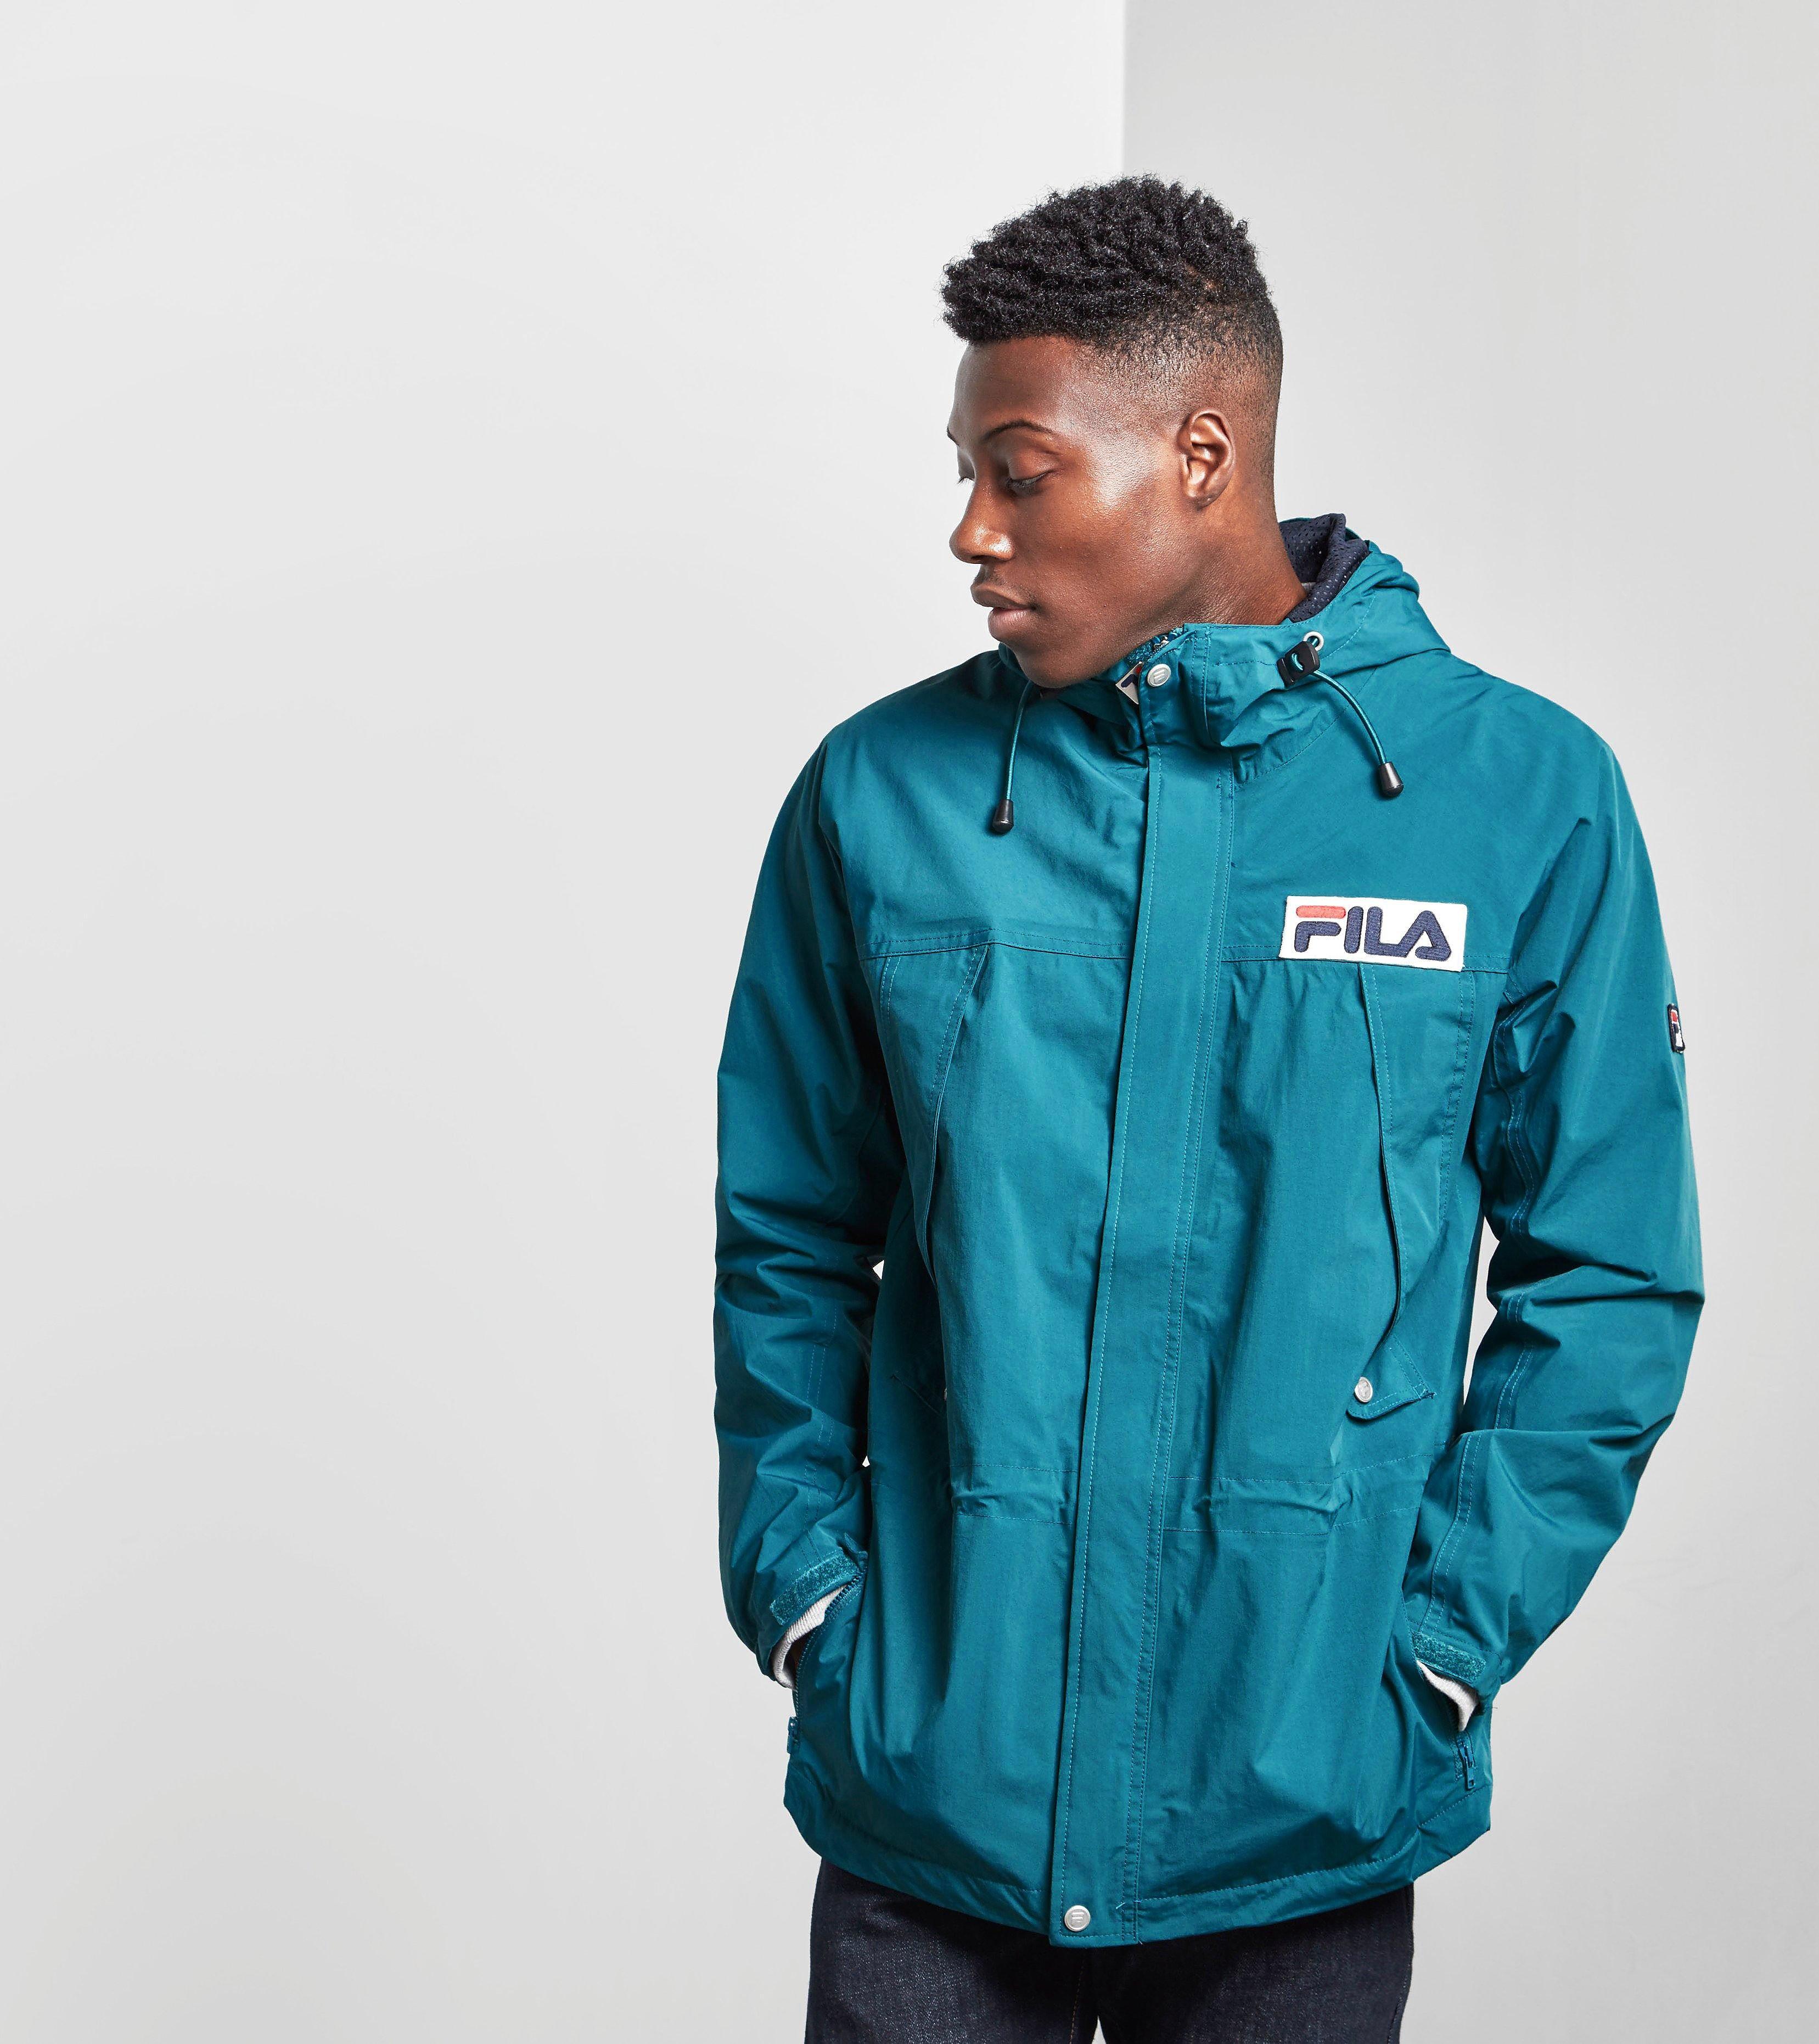 Fila Val d'Isere Jacket